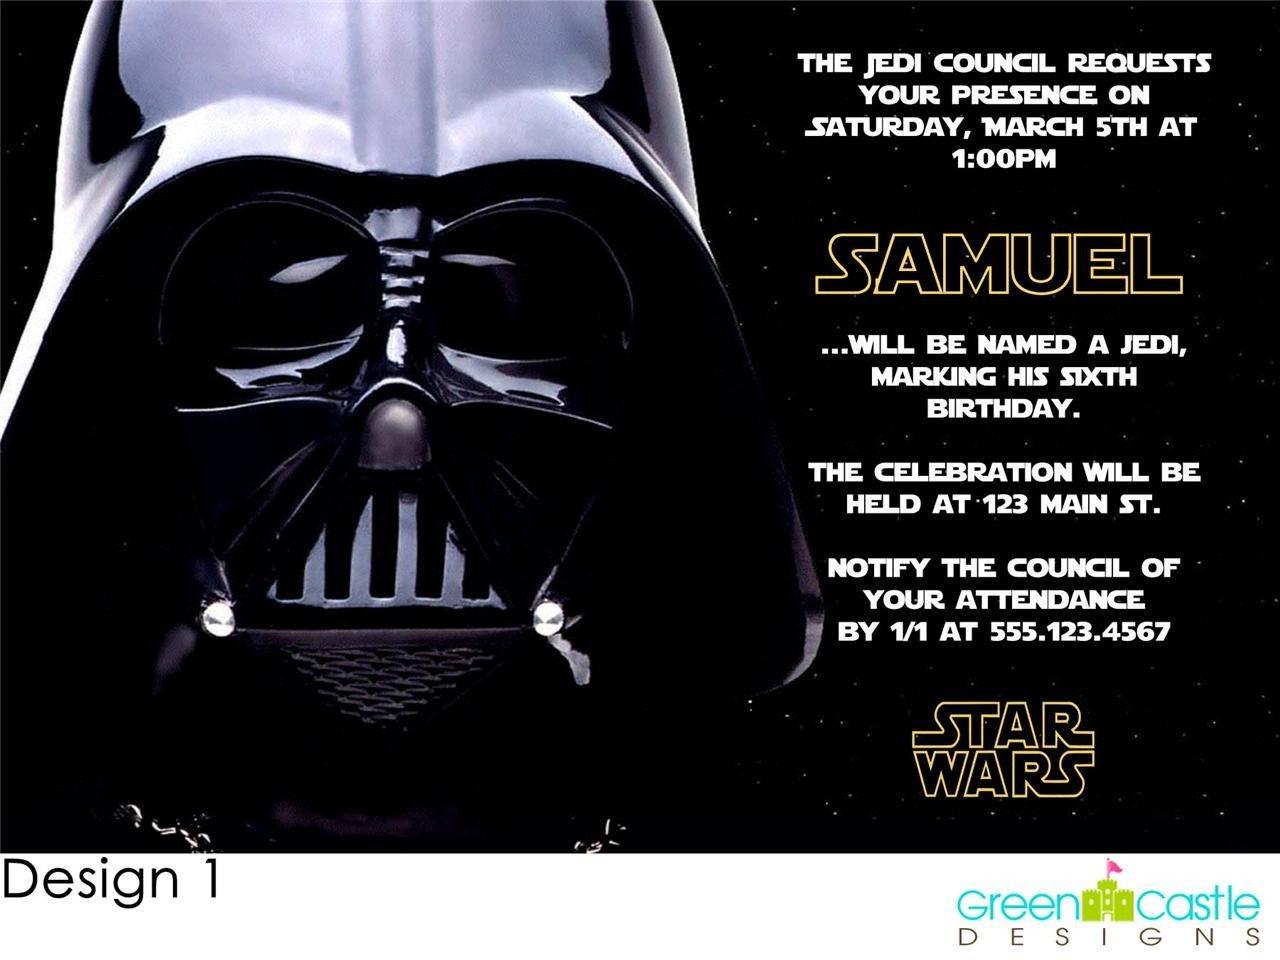 Star Wars Invitation Templates Free Star Wars Birthday Party Invitations Templates